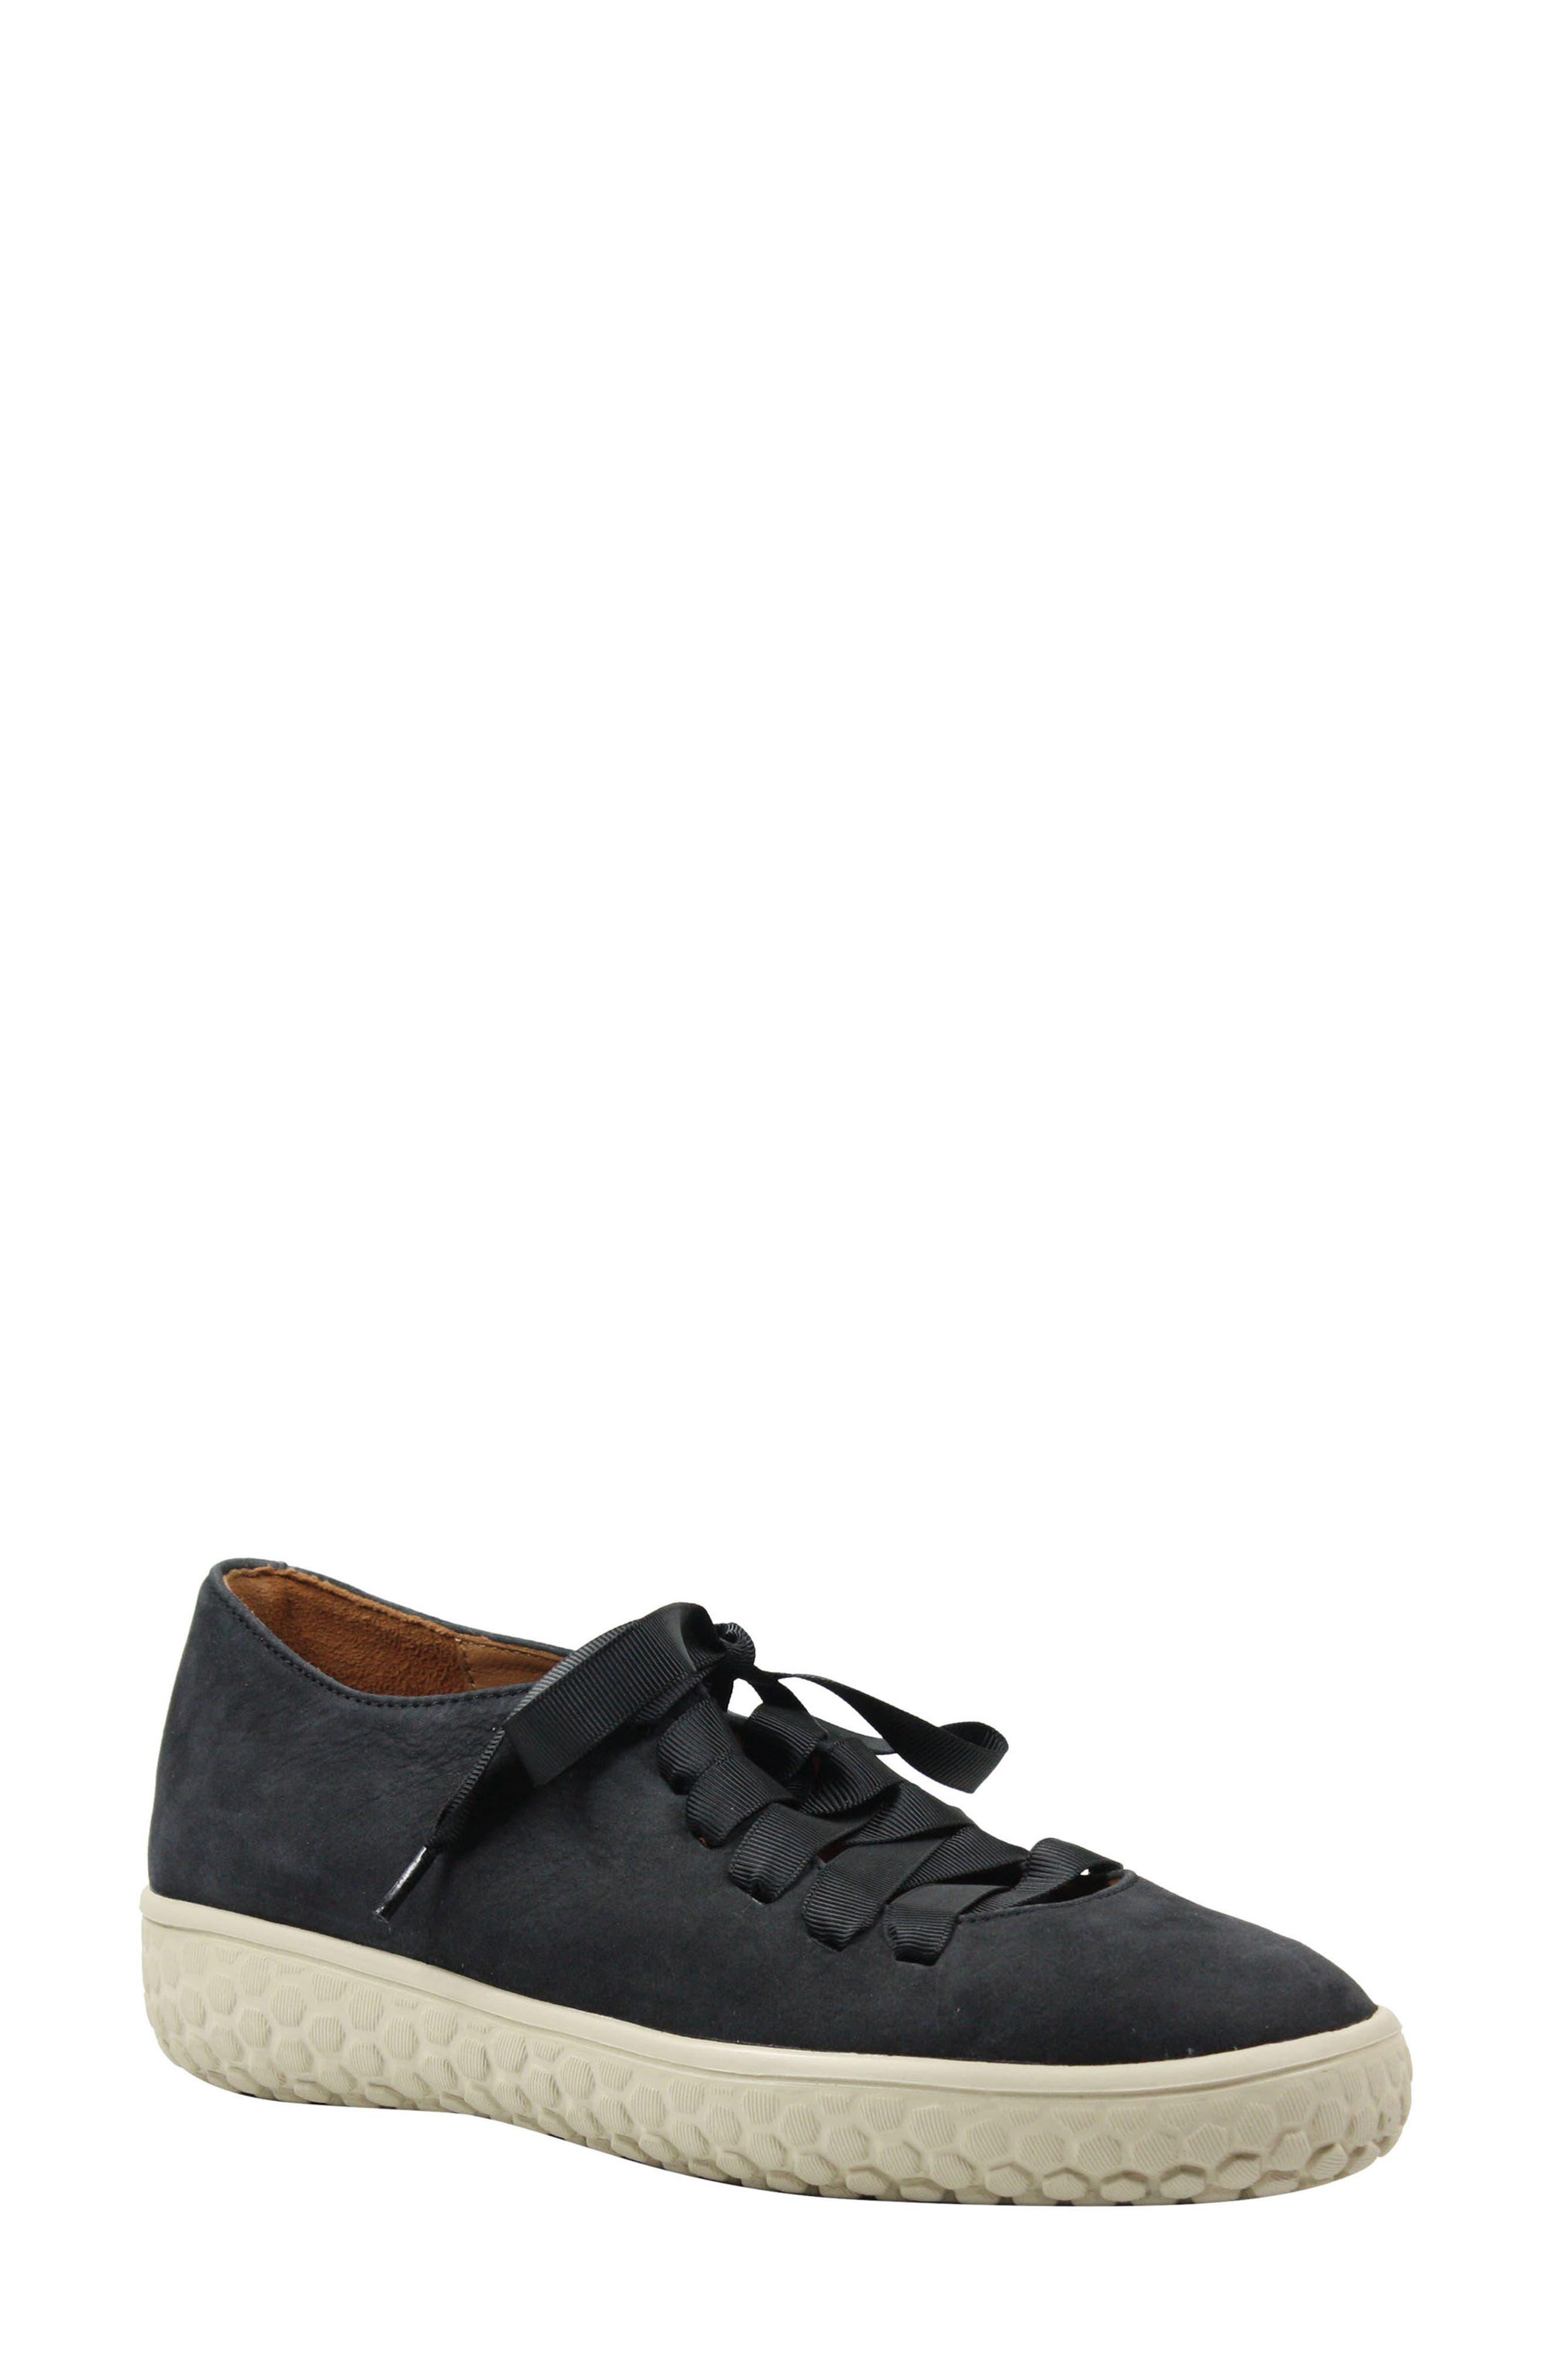 Zaheera Sneaker,                         Main,                         color, BLACK NUBUCK LEATHER